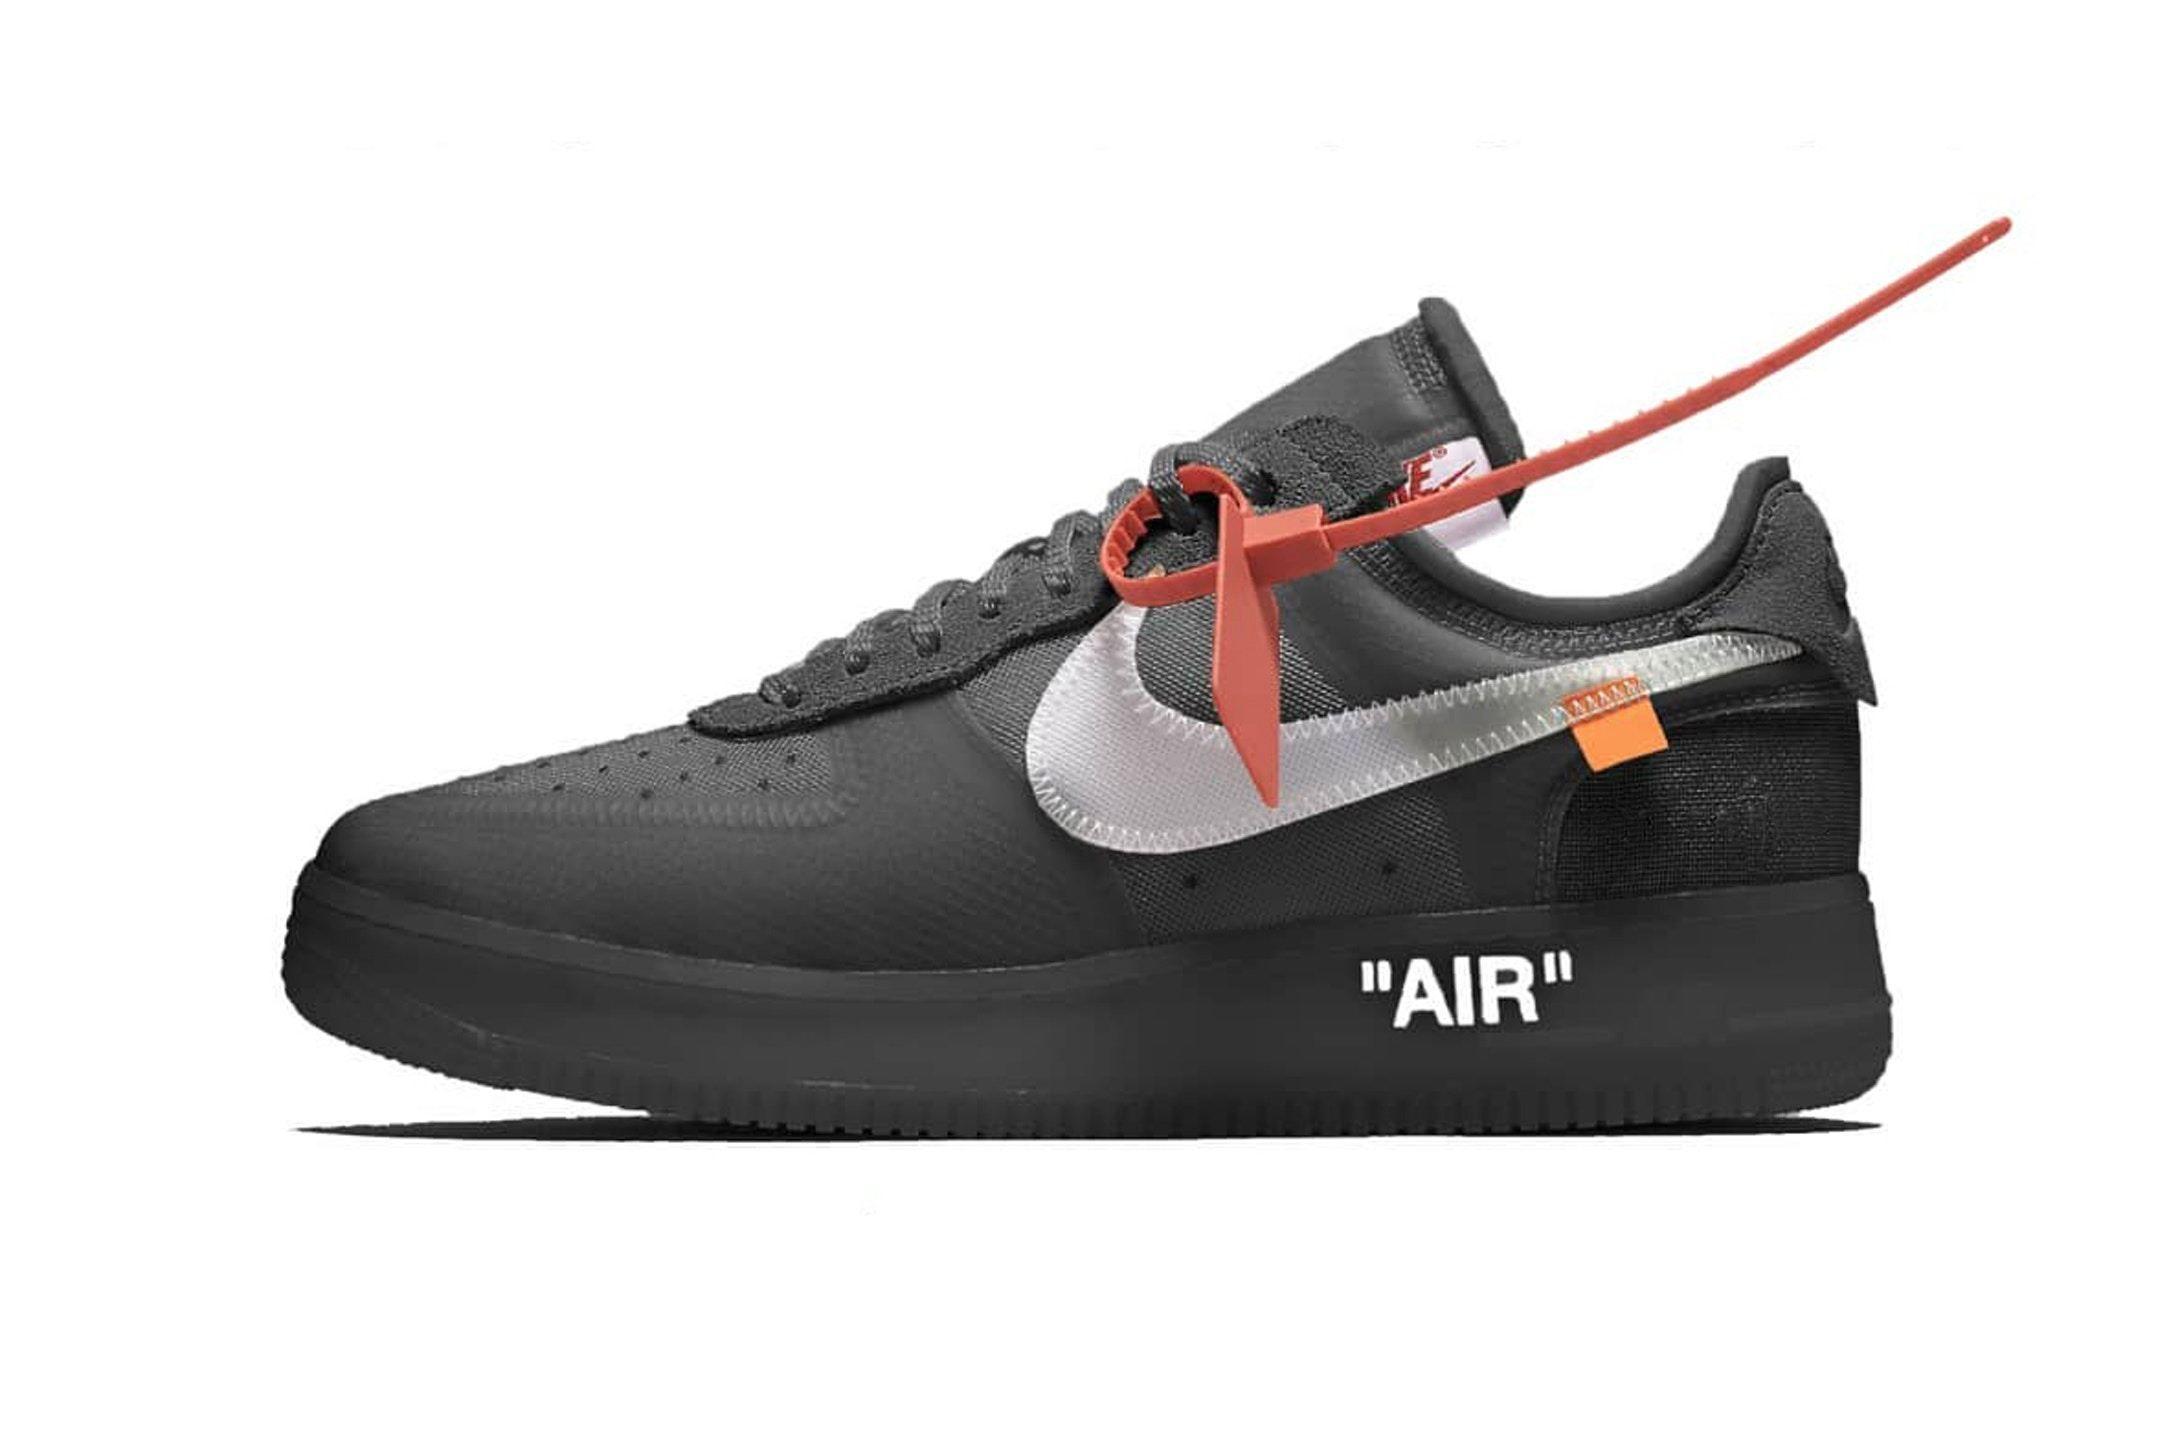 Virgil Abloh x Nike Air Force 1 to Release in Black - EU Kicks: Sneaker